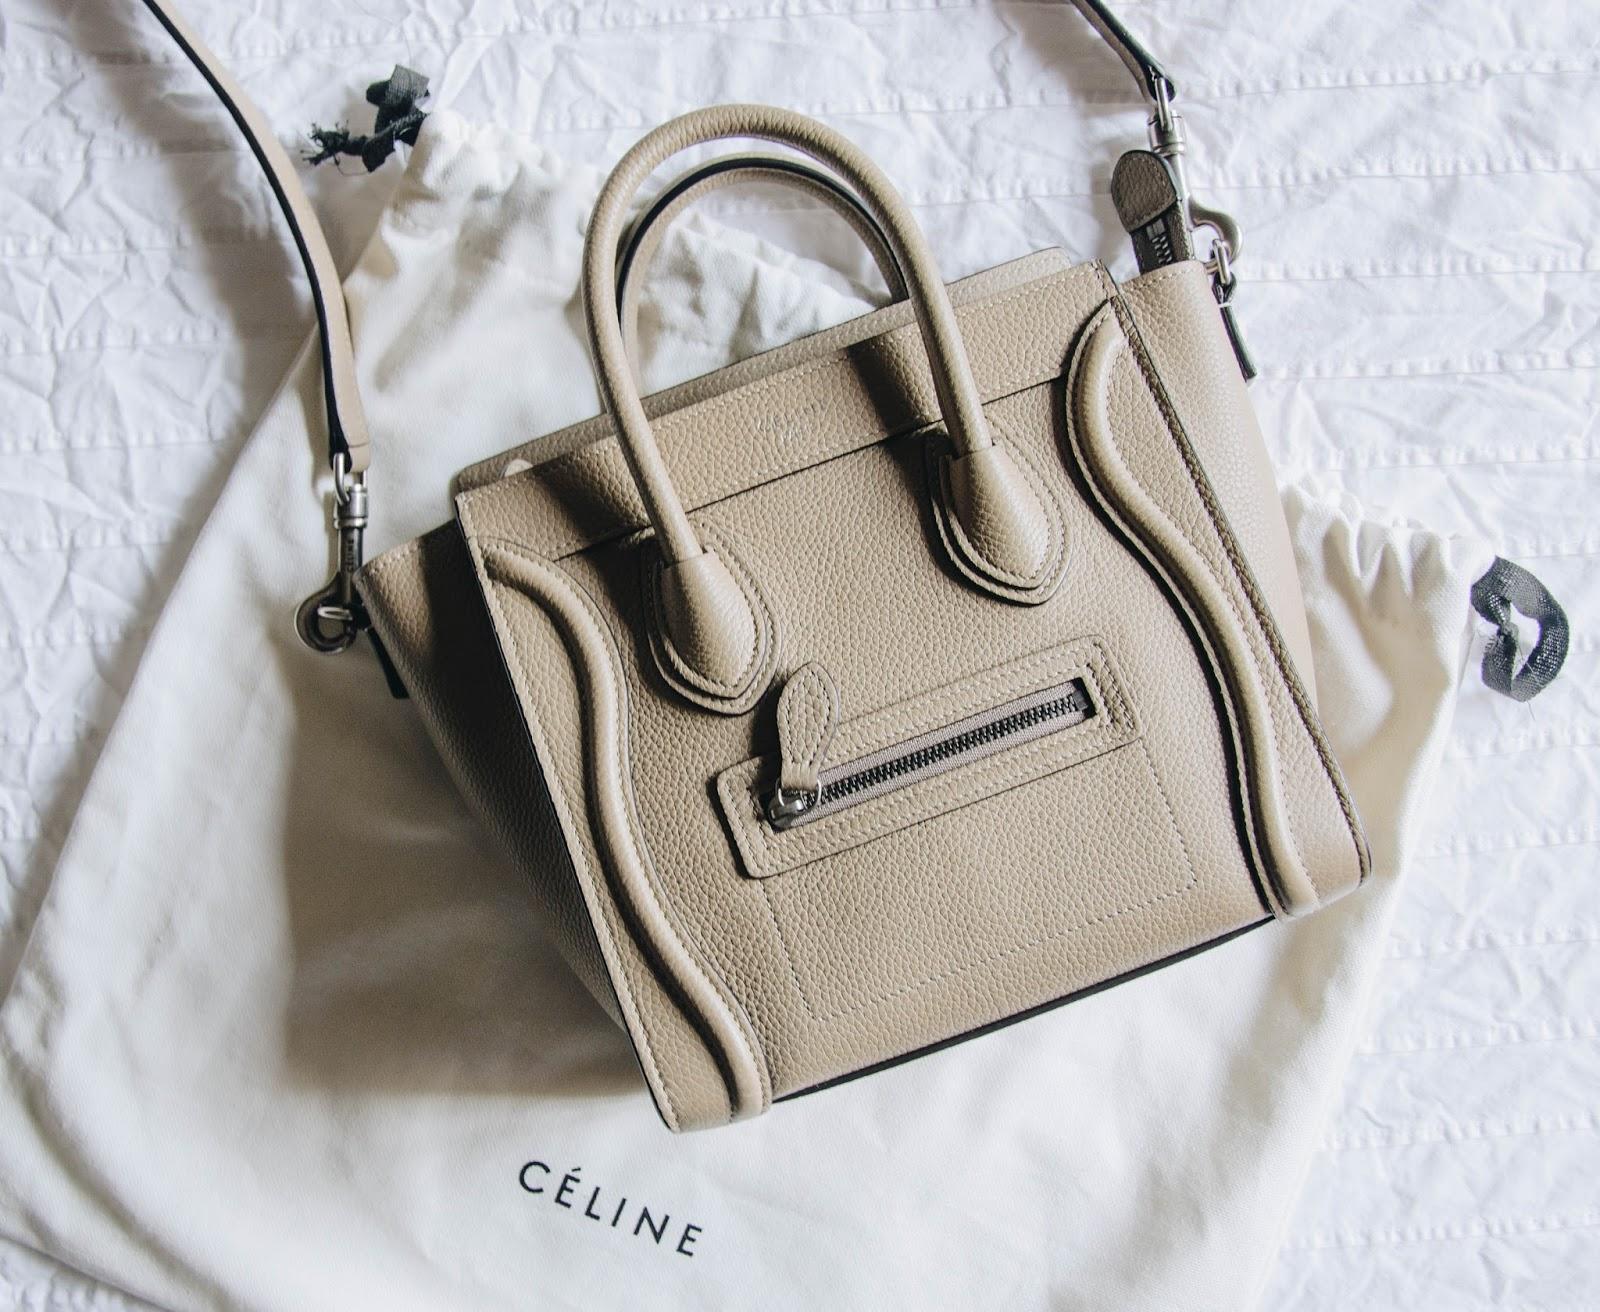 Céline Nano Luggage Tote Review 7c52eac1f7d94